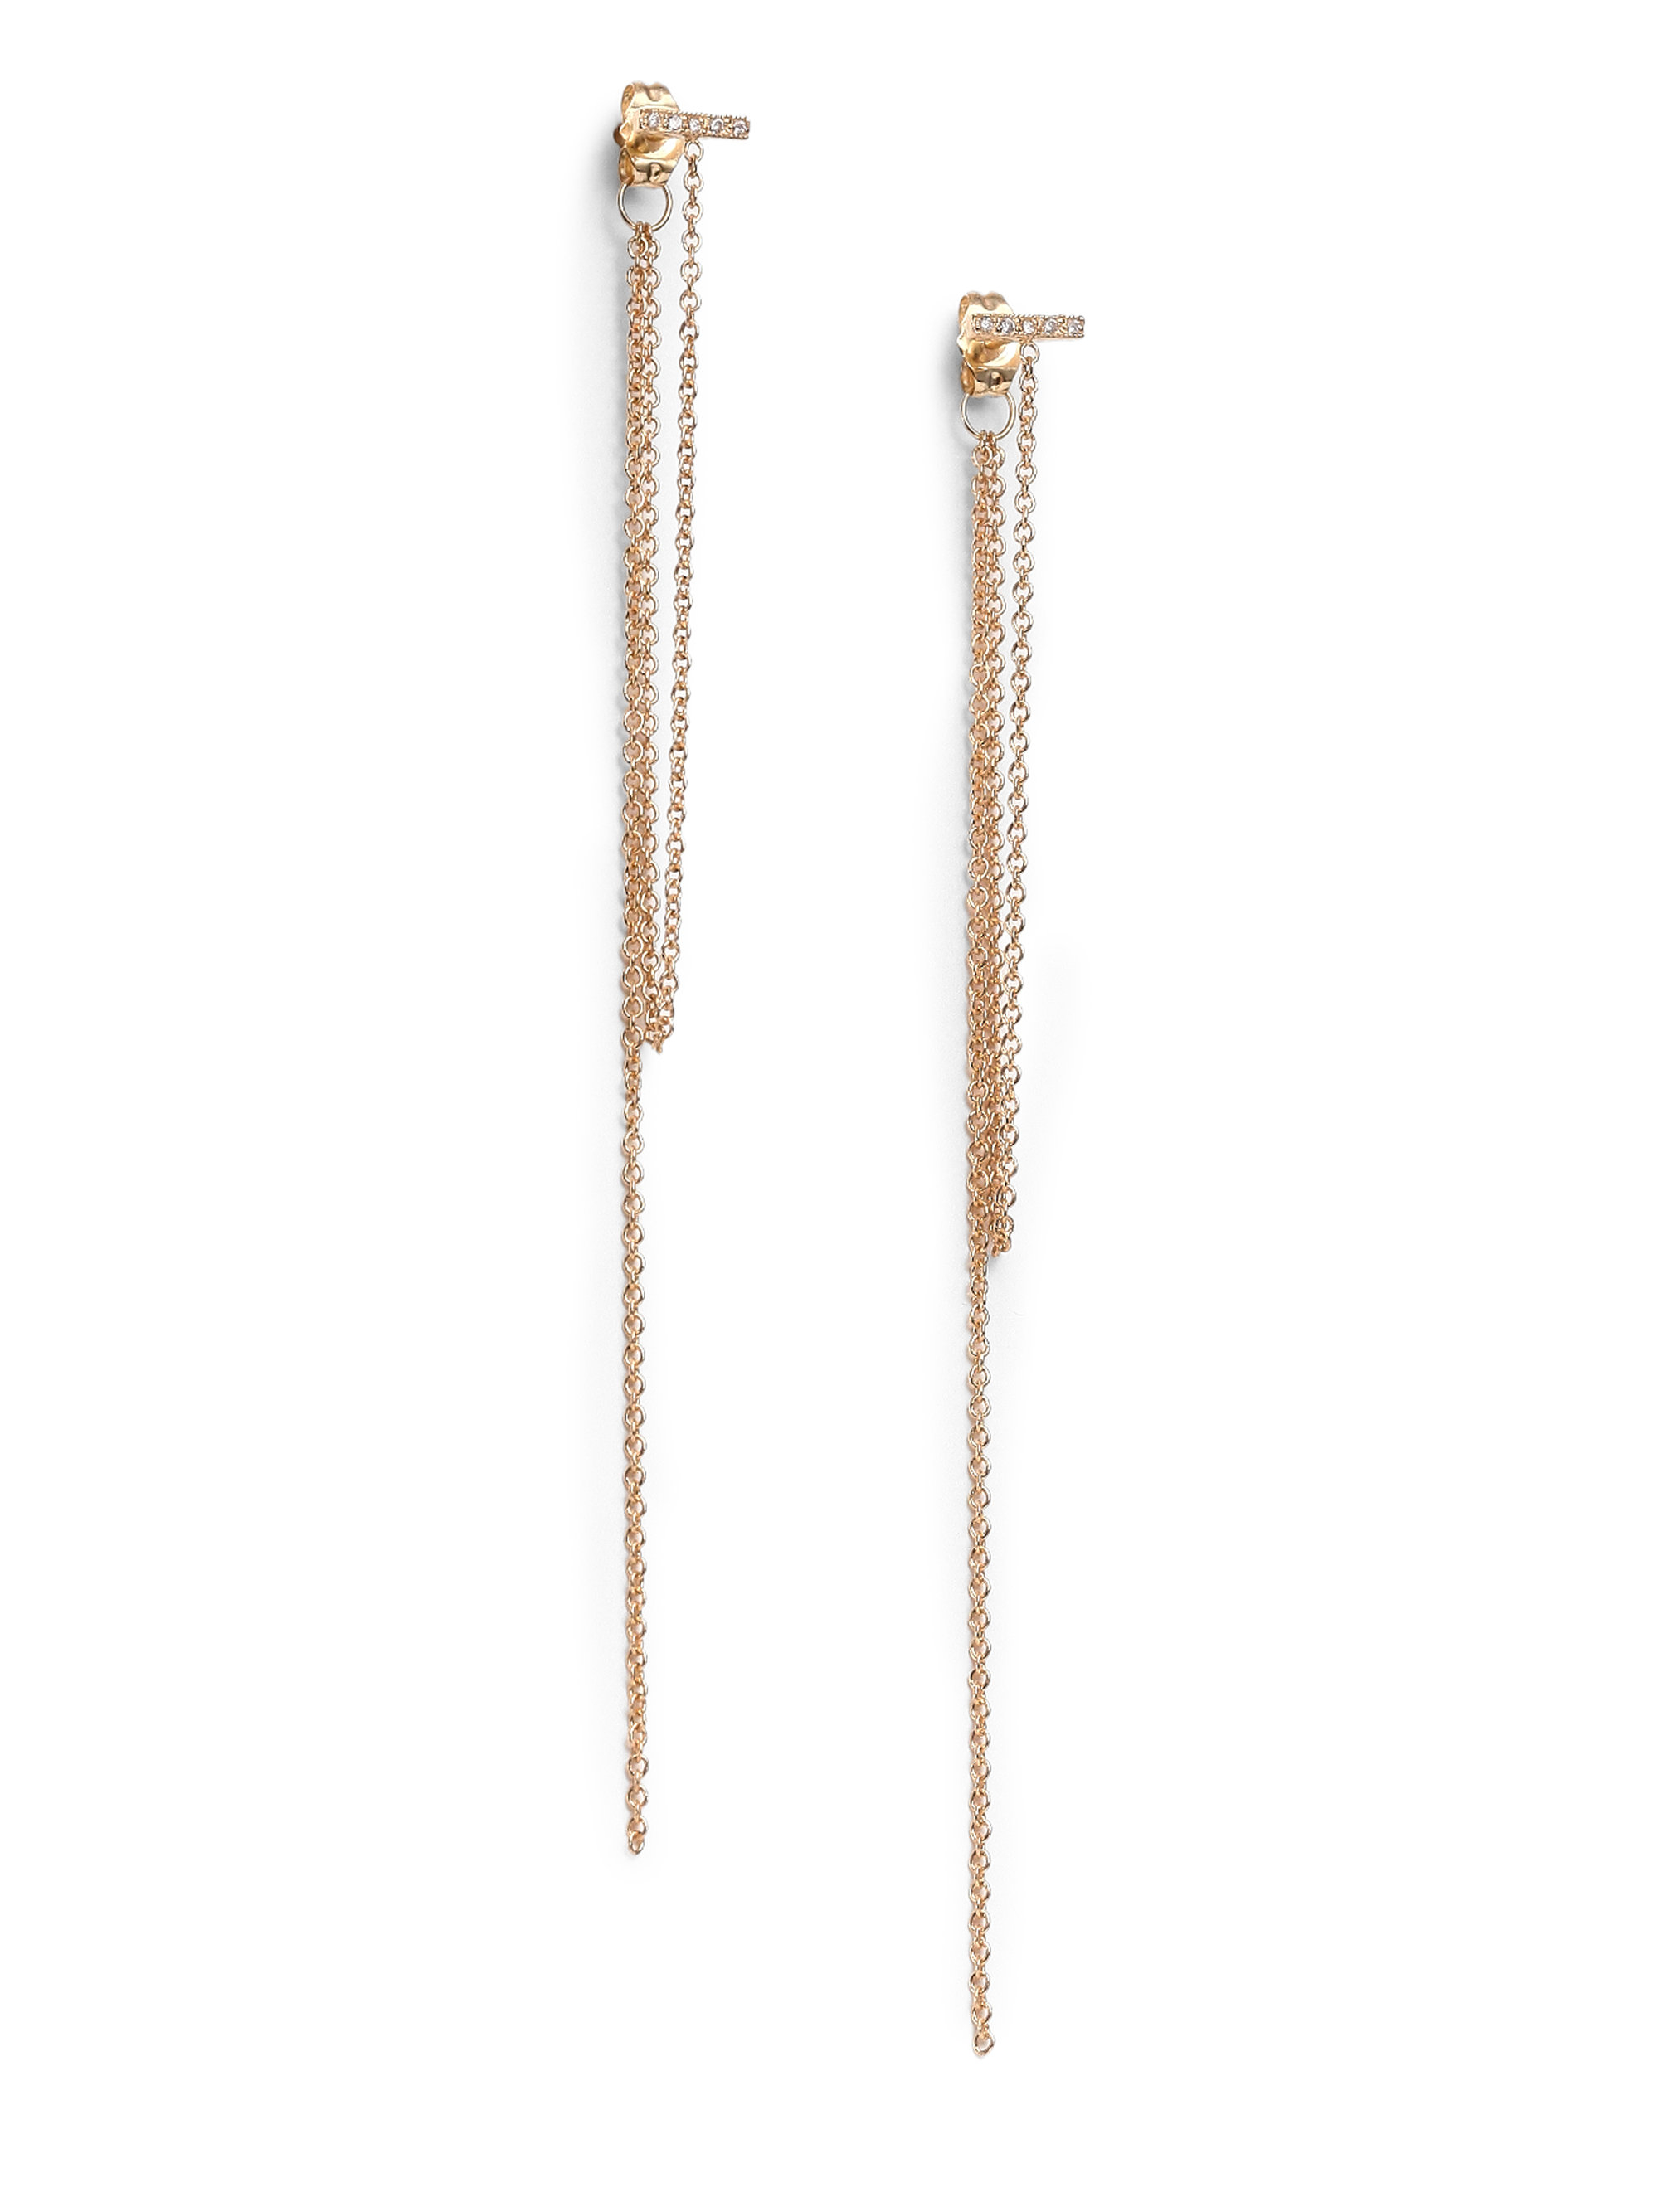 Zoe chicco Diamond & 14k Yellow Gold Bar Fringe Earrings